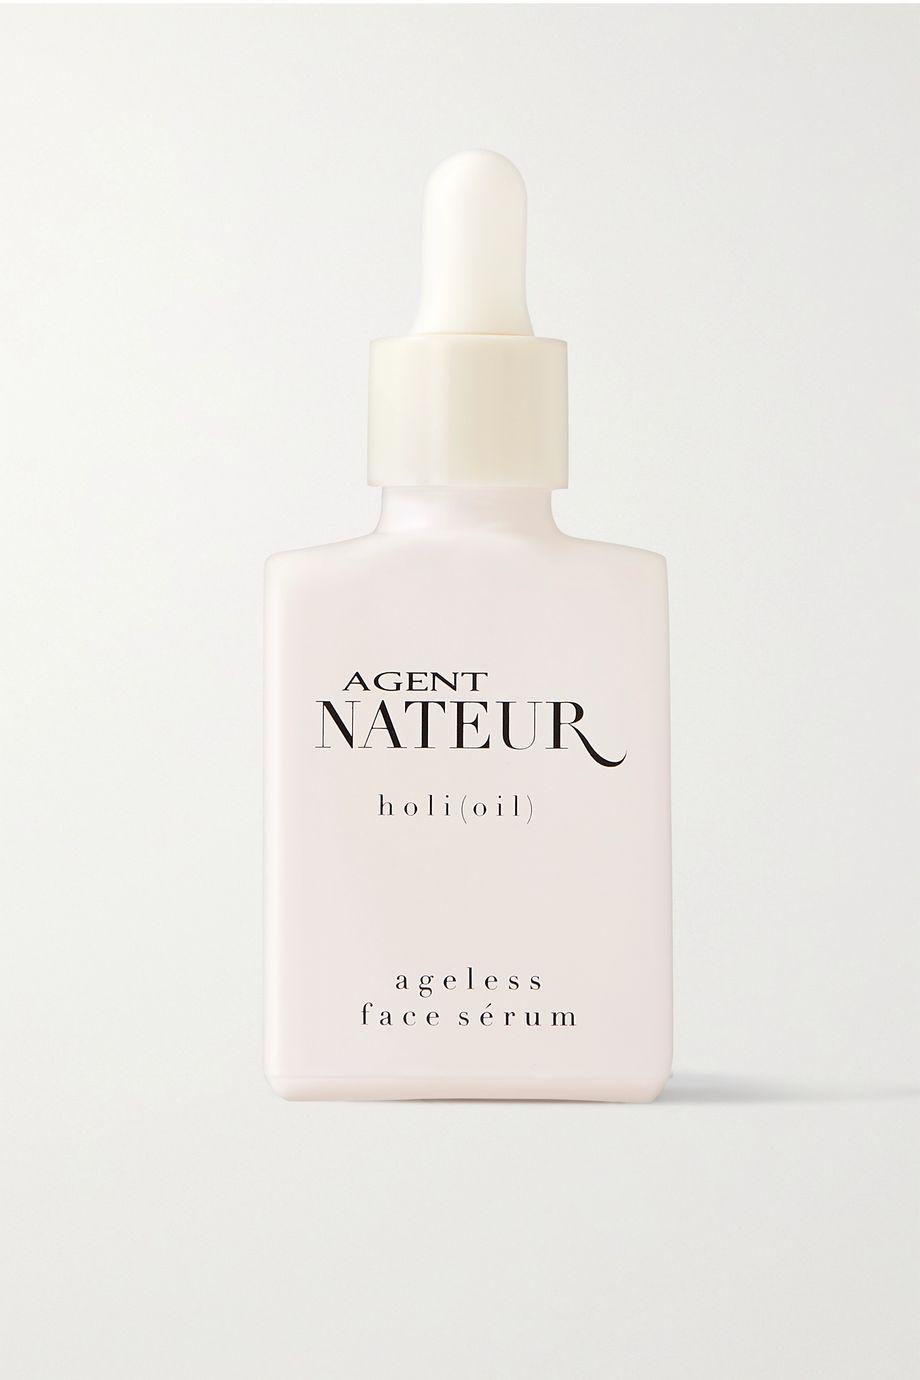 Agent Nateur Holi(oil) Refining Face Oil, 30 ml – Gesichtsöl